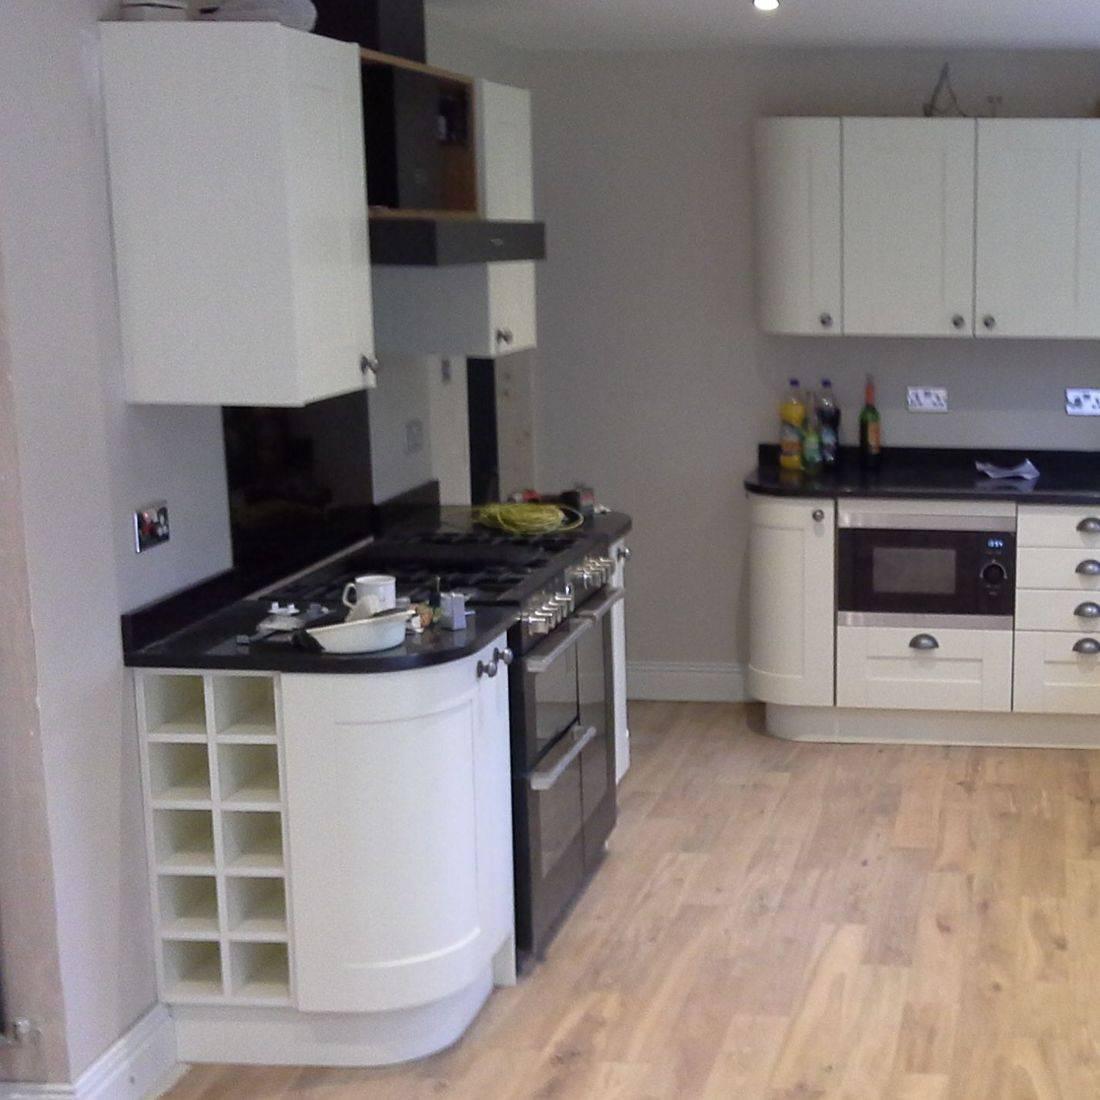 Kitchen fitters in Surrey